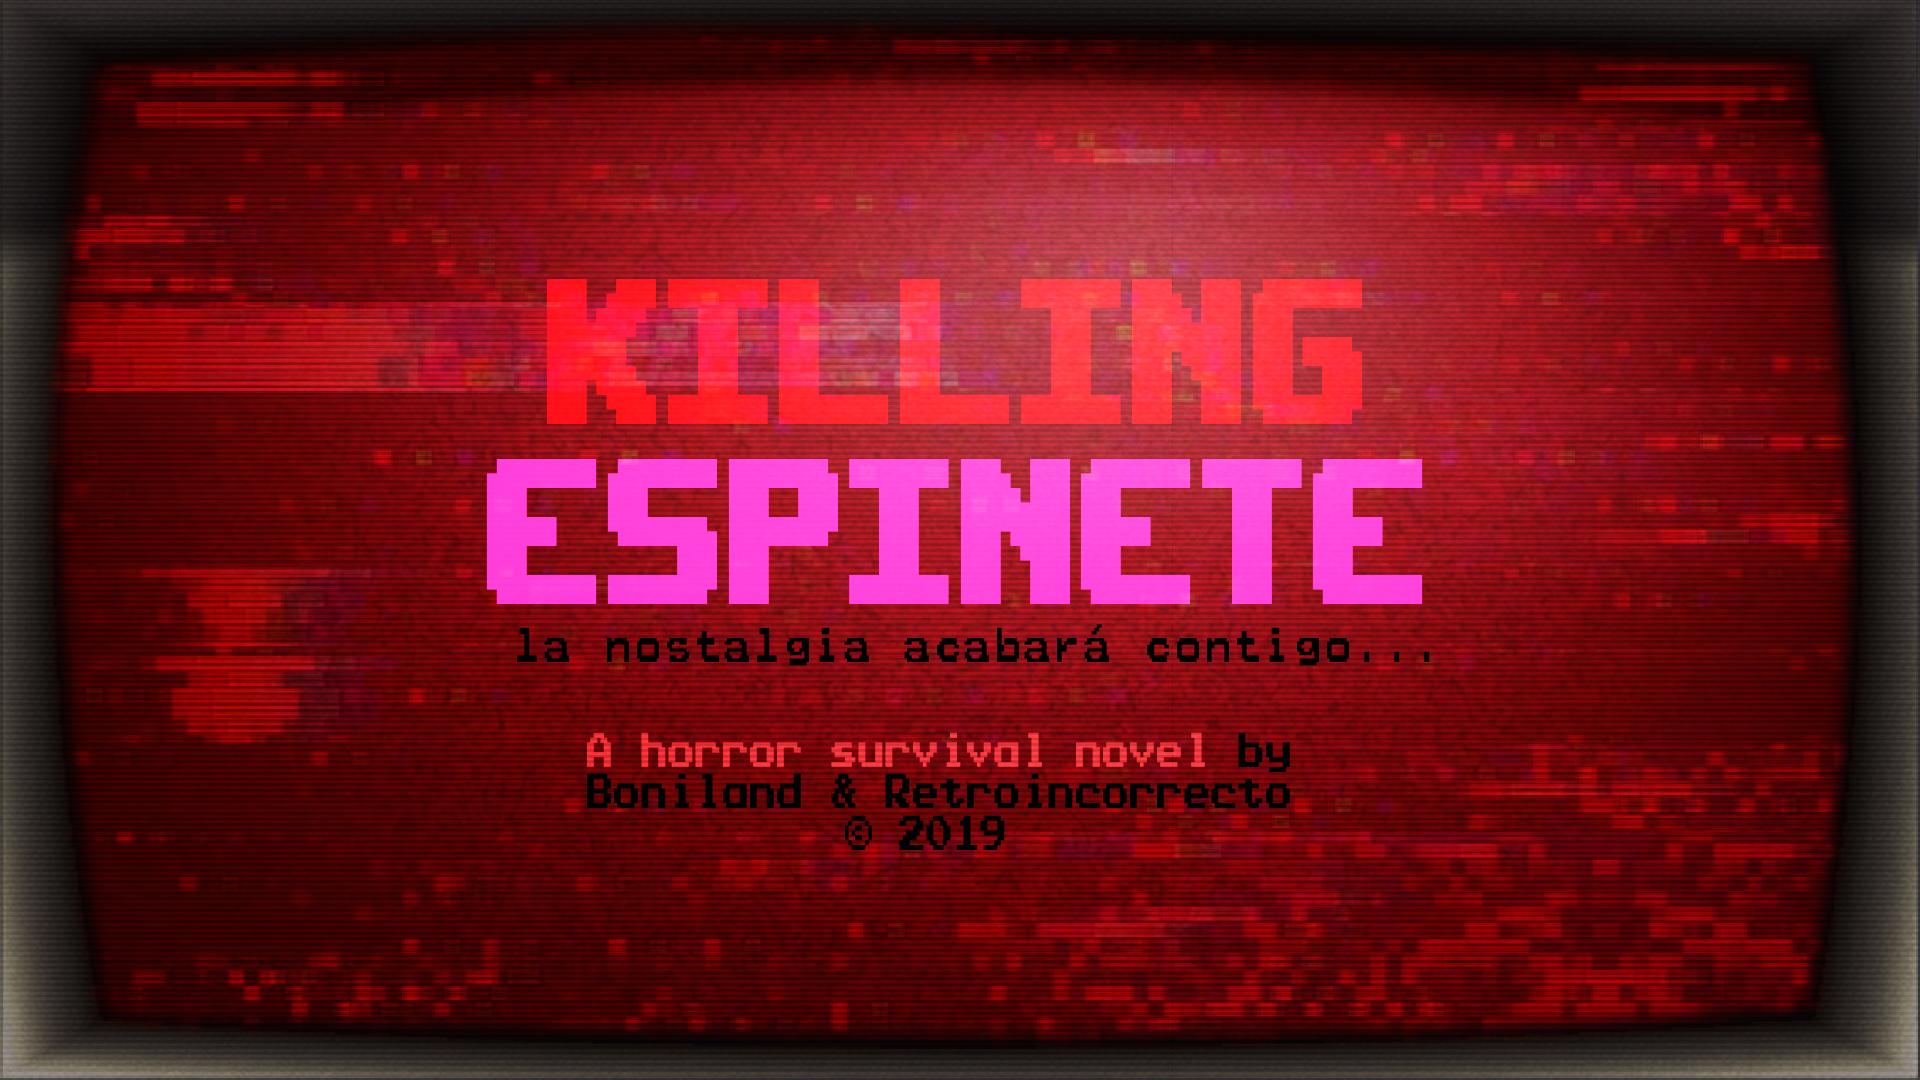 Killing Espinete